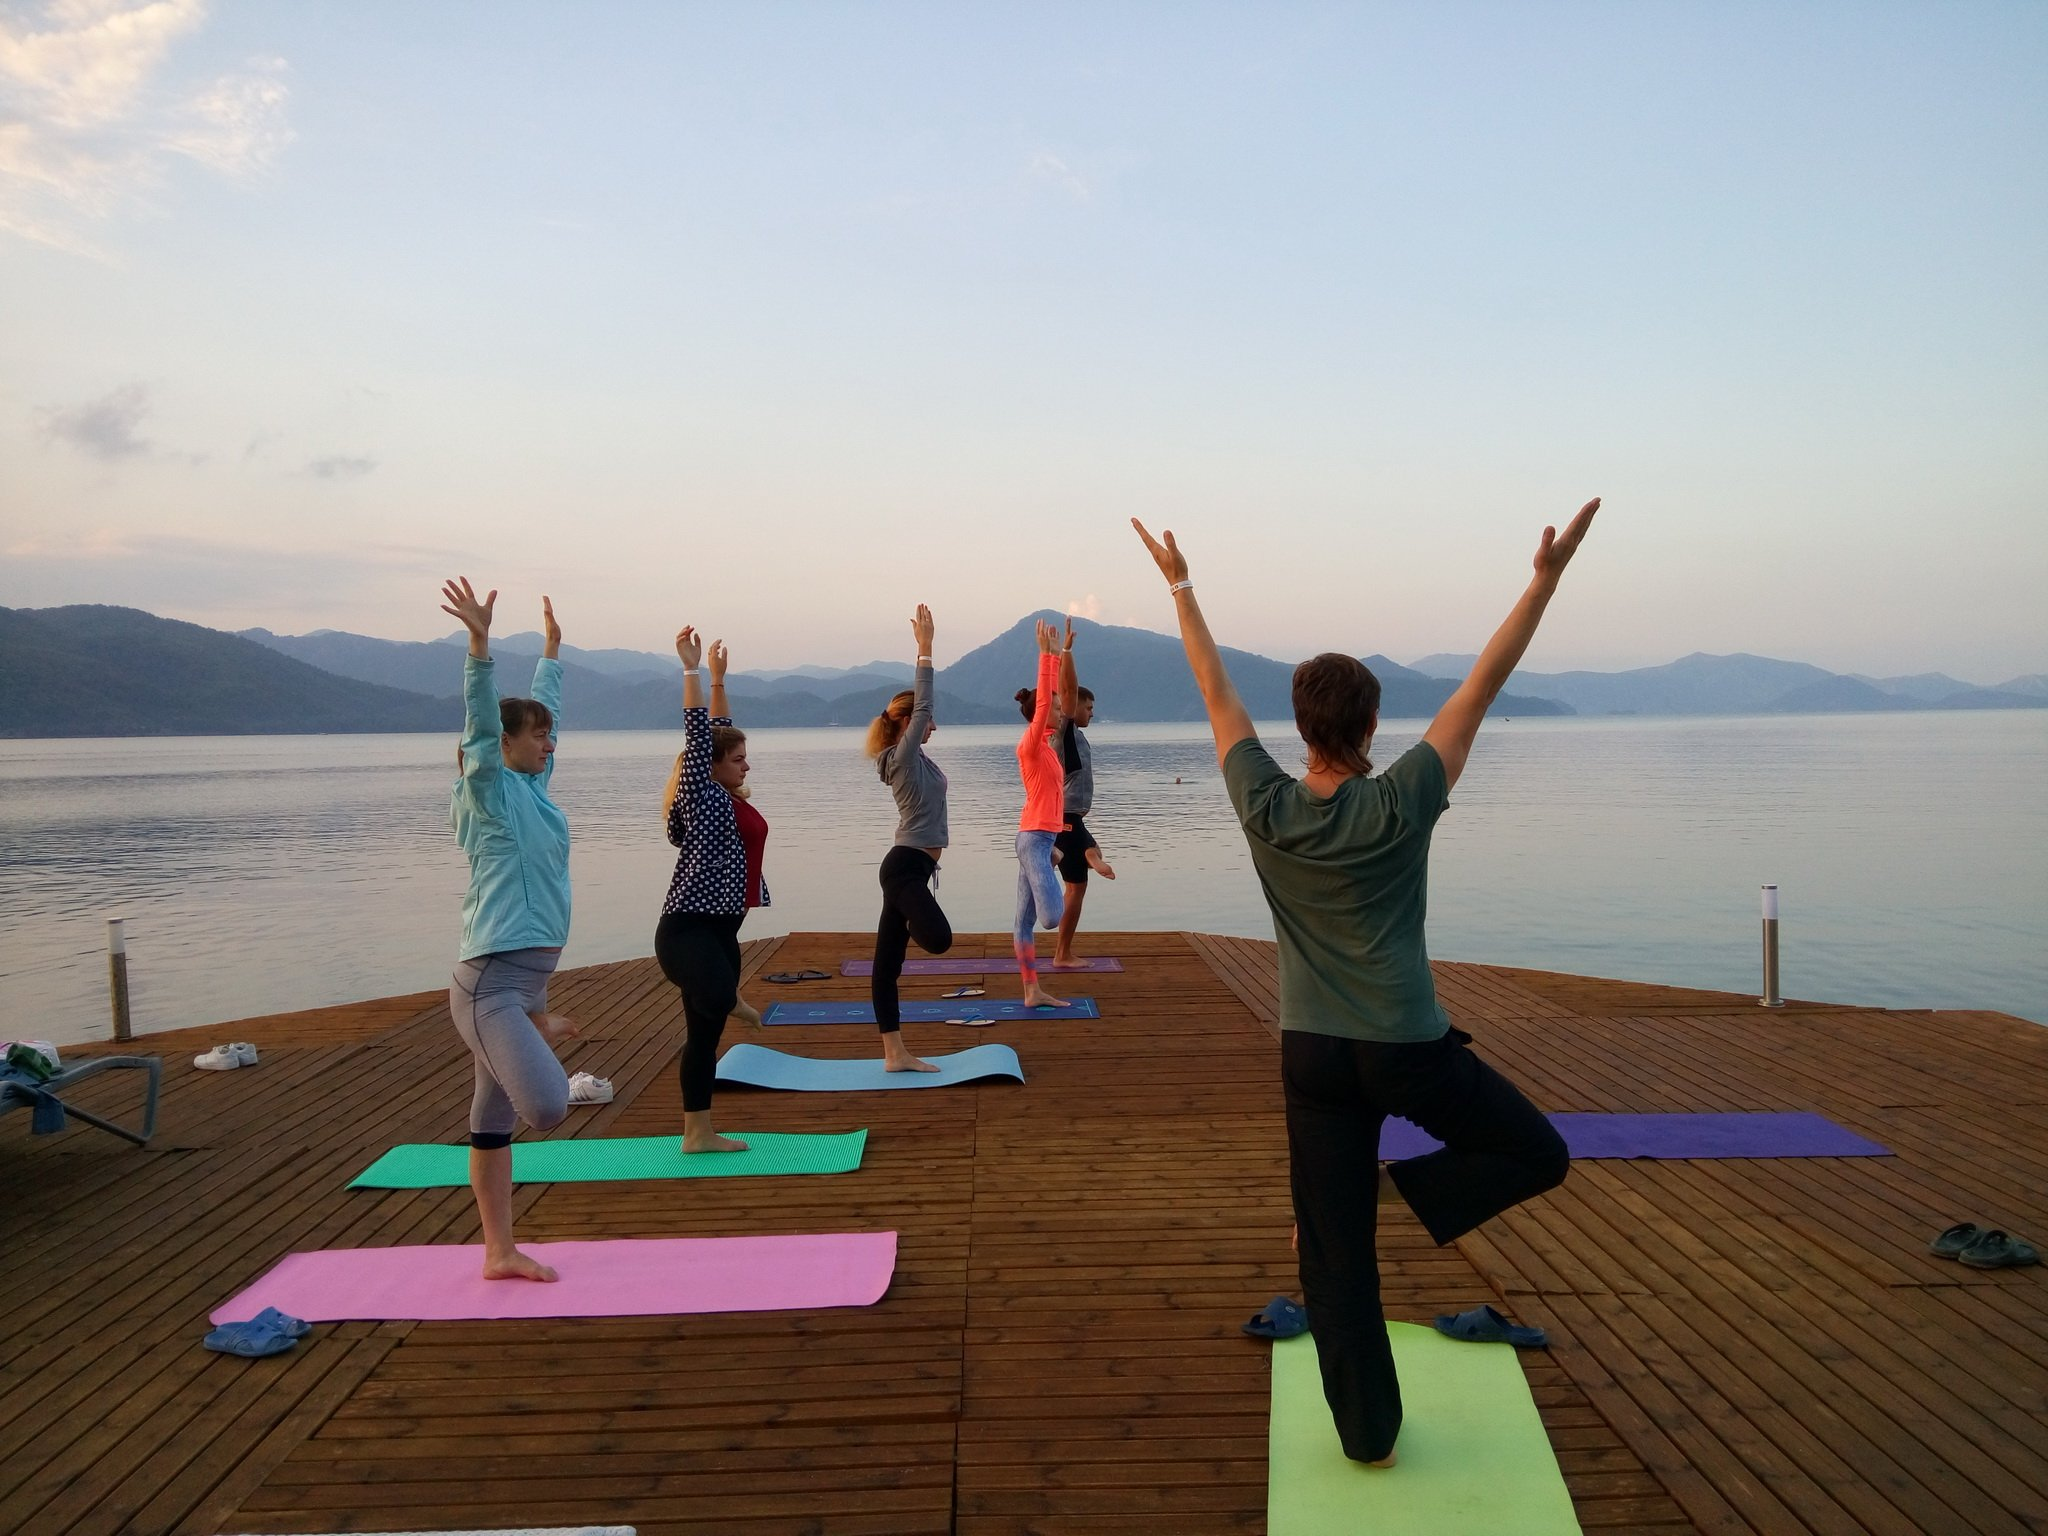 Осенний йога семинар, октябрь 2017 - Турция, Мармарис